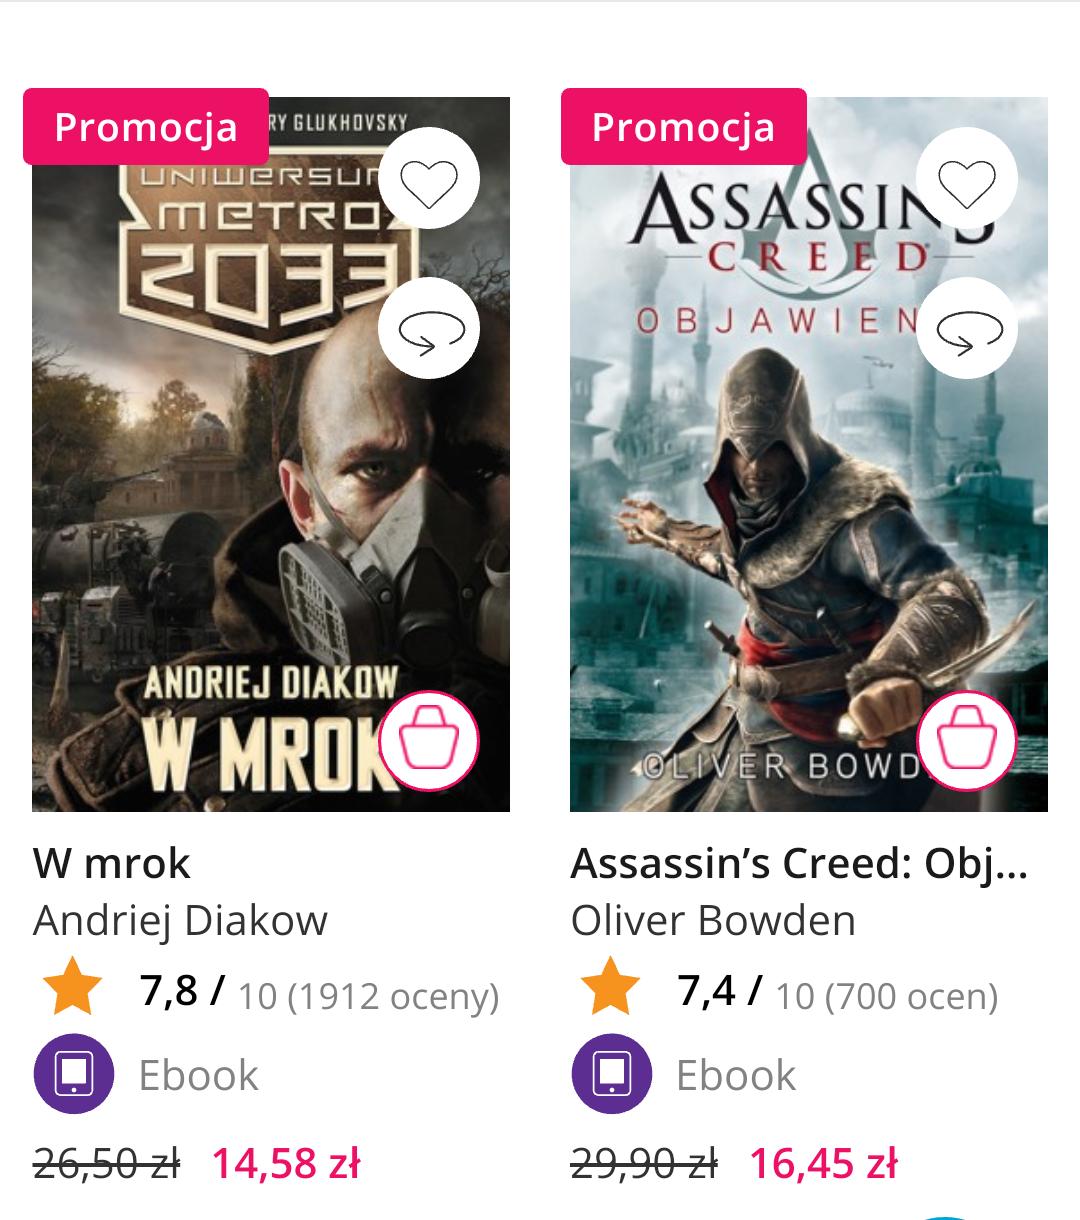 Ebooki Warcraft, Metro i inne do - 45%